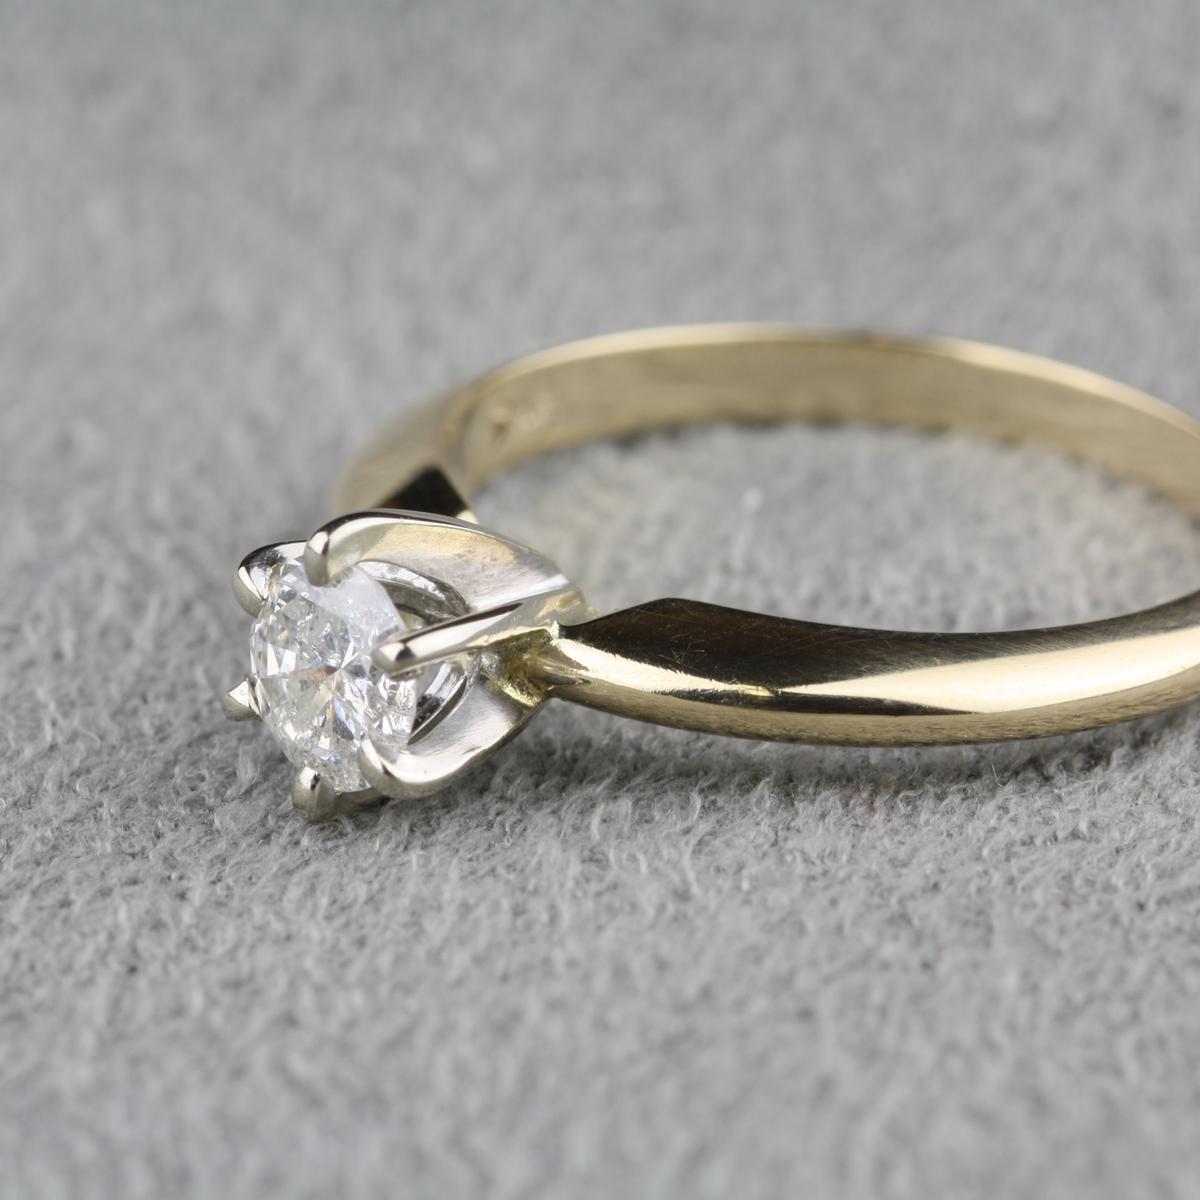 Pre Owned 37 Carat Diamond Engagement Ring in 14 Karat Yellow Gold